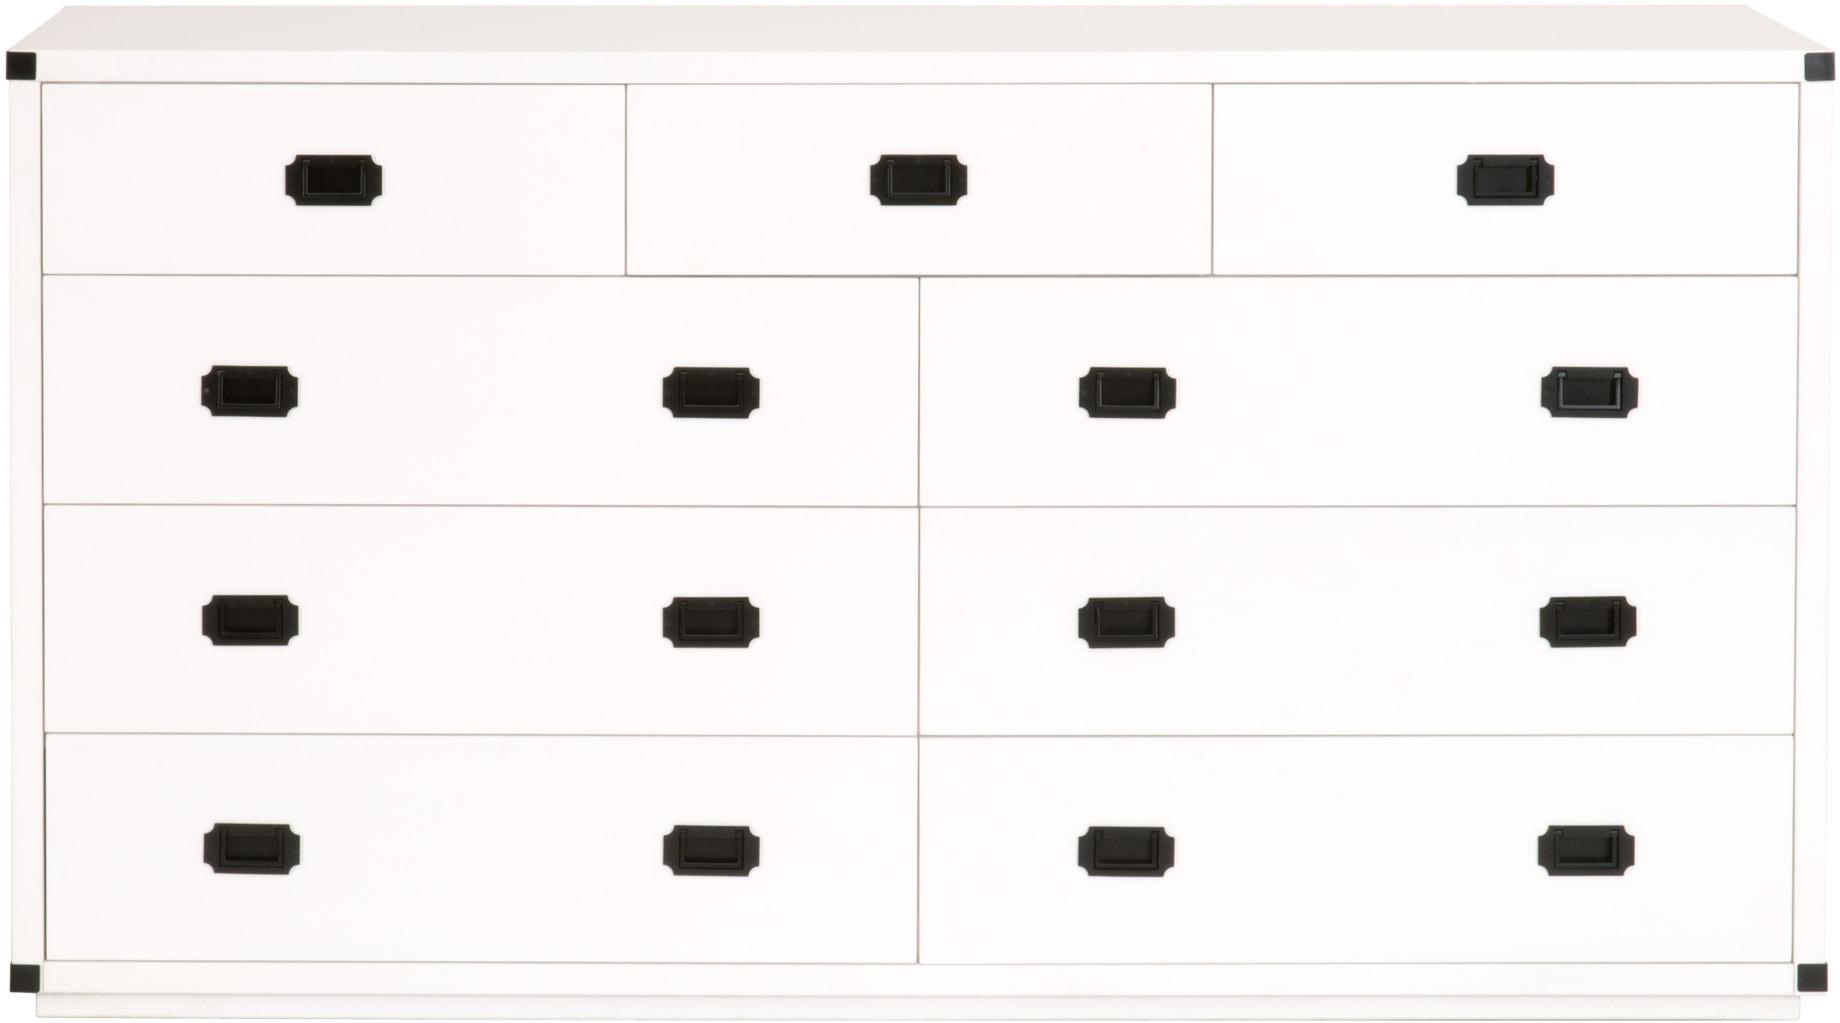 Essentials For Living Bedroom Bradley 9 Drawer Media Dresser 6133 Wht Blk Setting The Space